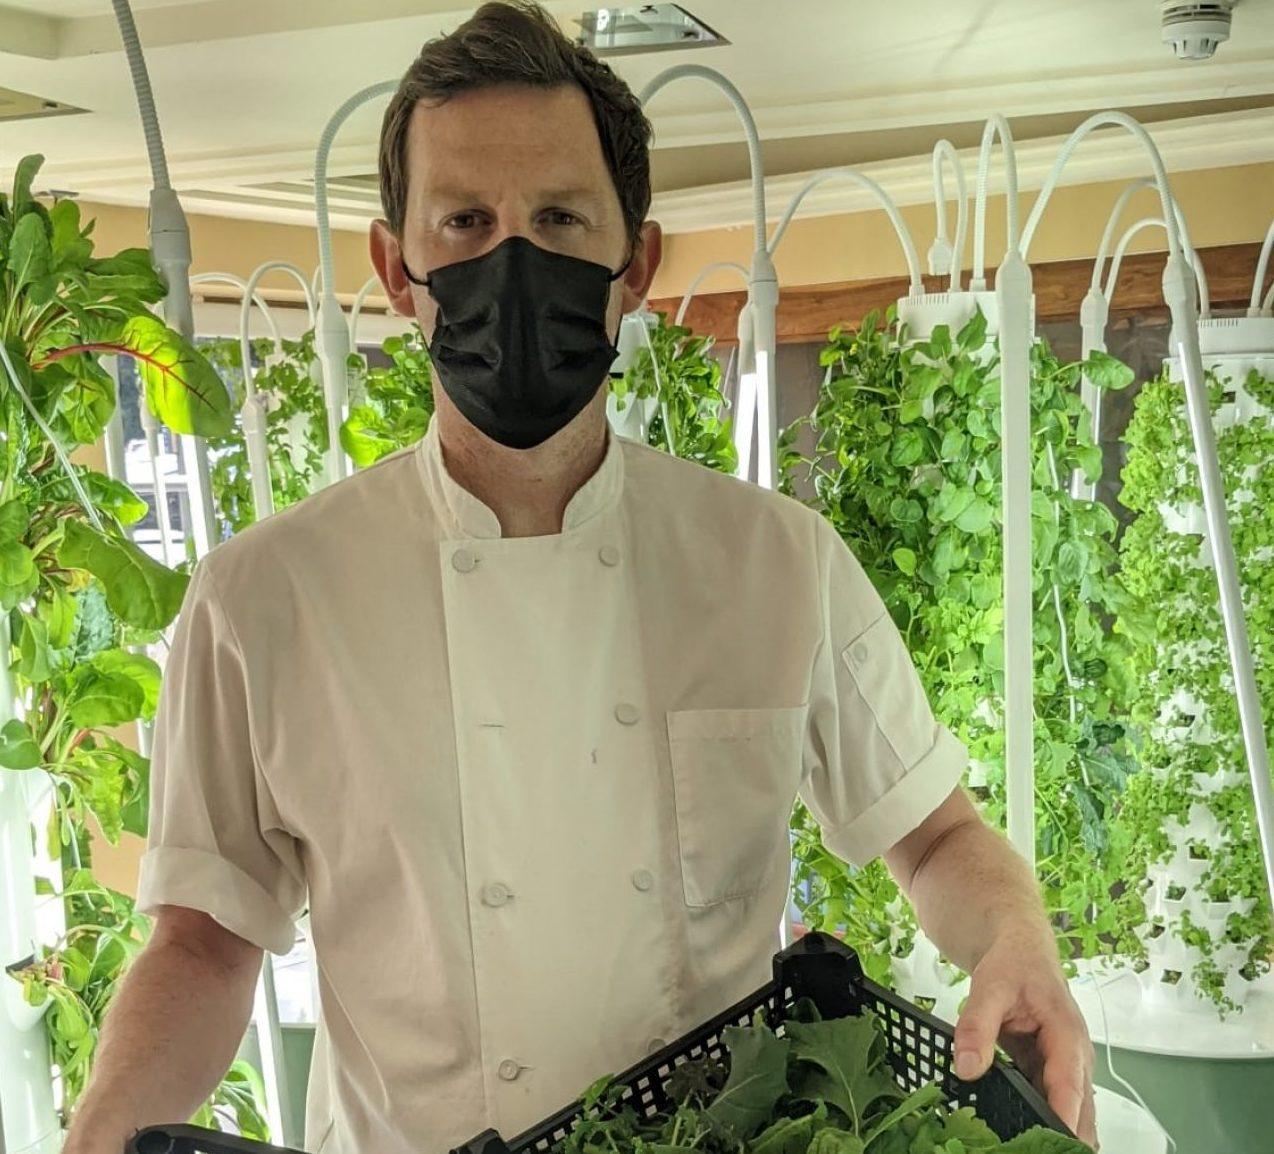 0210927_Culinary_Director_of_Killarney_Plaza__John_OLeary__first_harvest.jpg